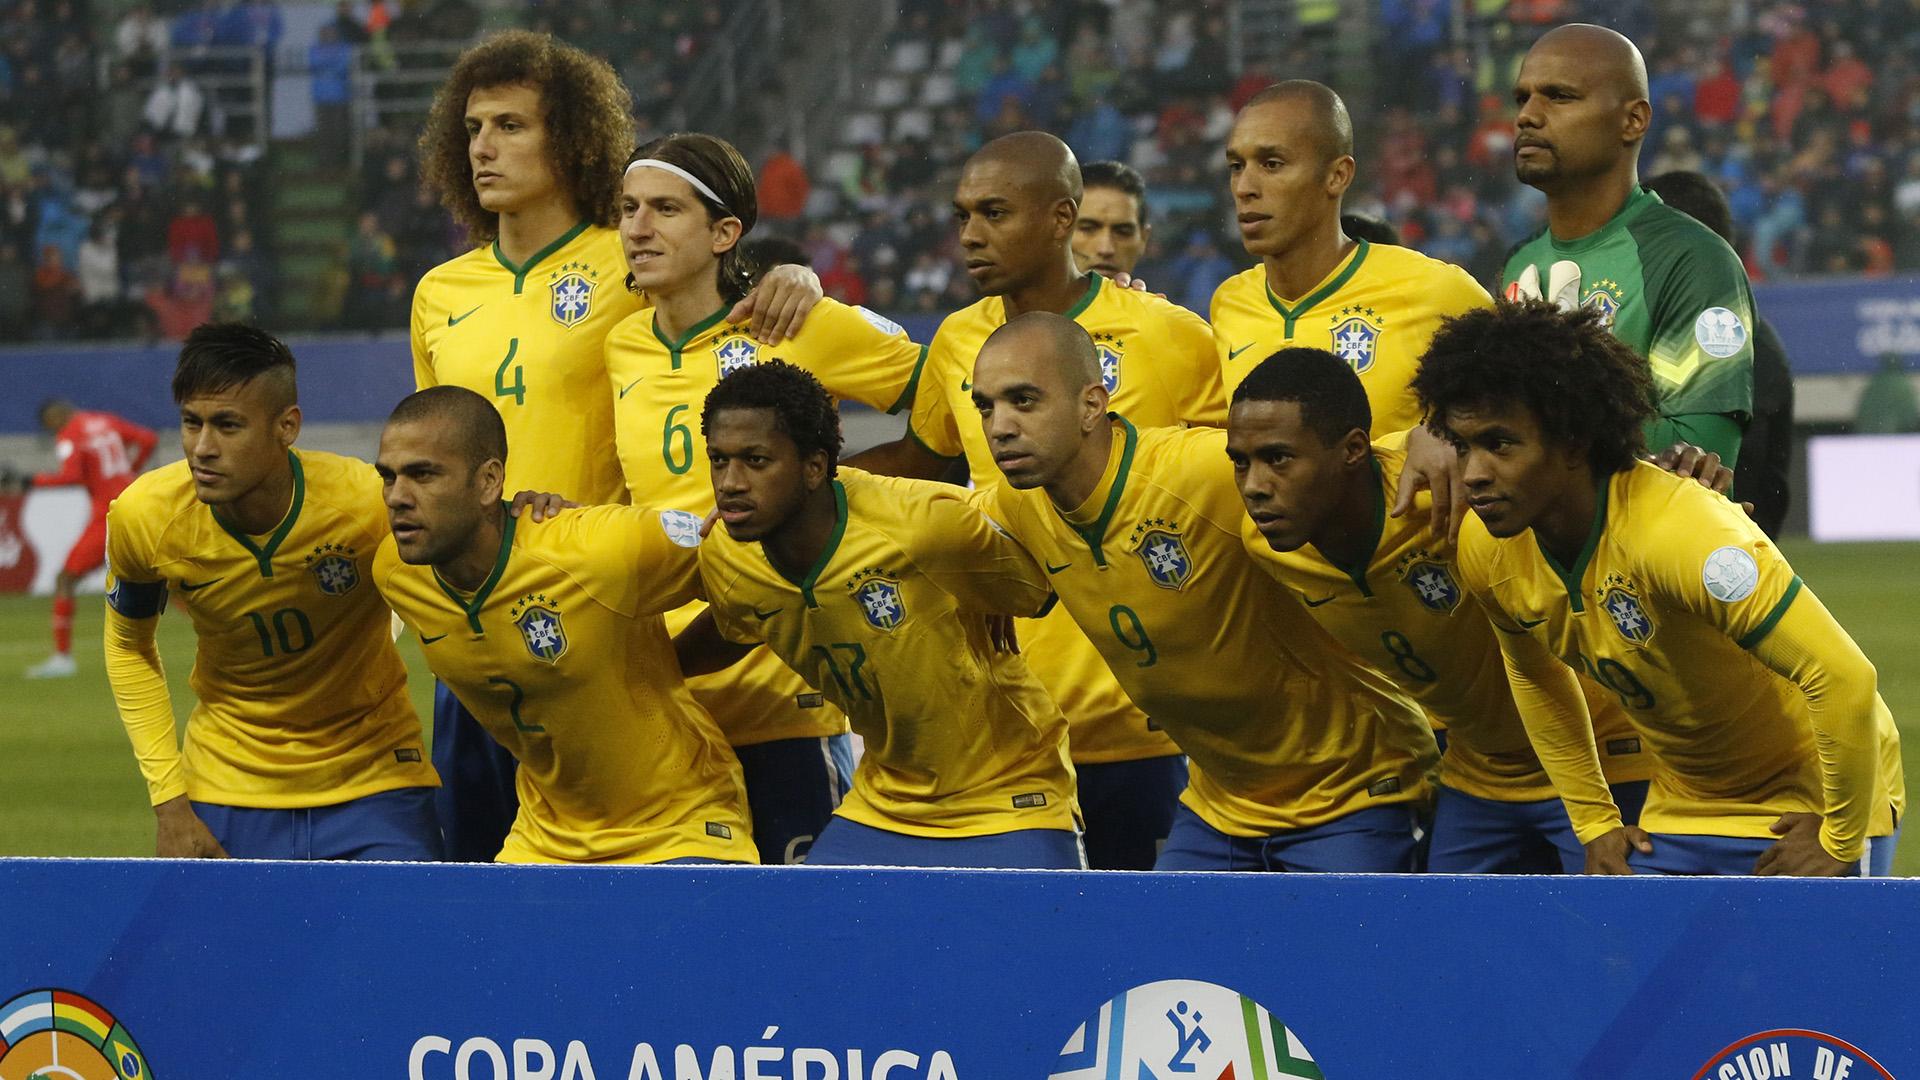 6a573bb715 lineup-brazil-peru-copa-america -temuco-14062015 8js55tmq2gej16mxpbddrktpg.jpg t -196771171